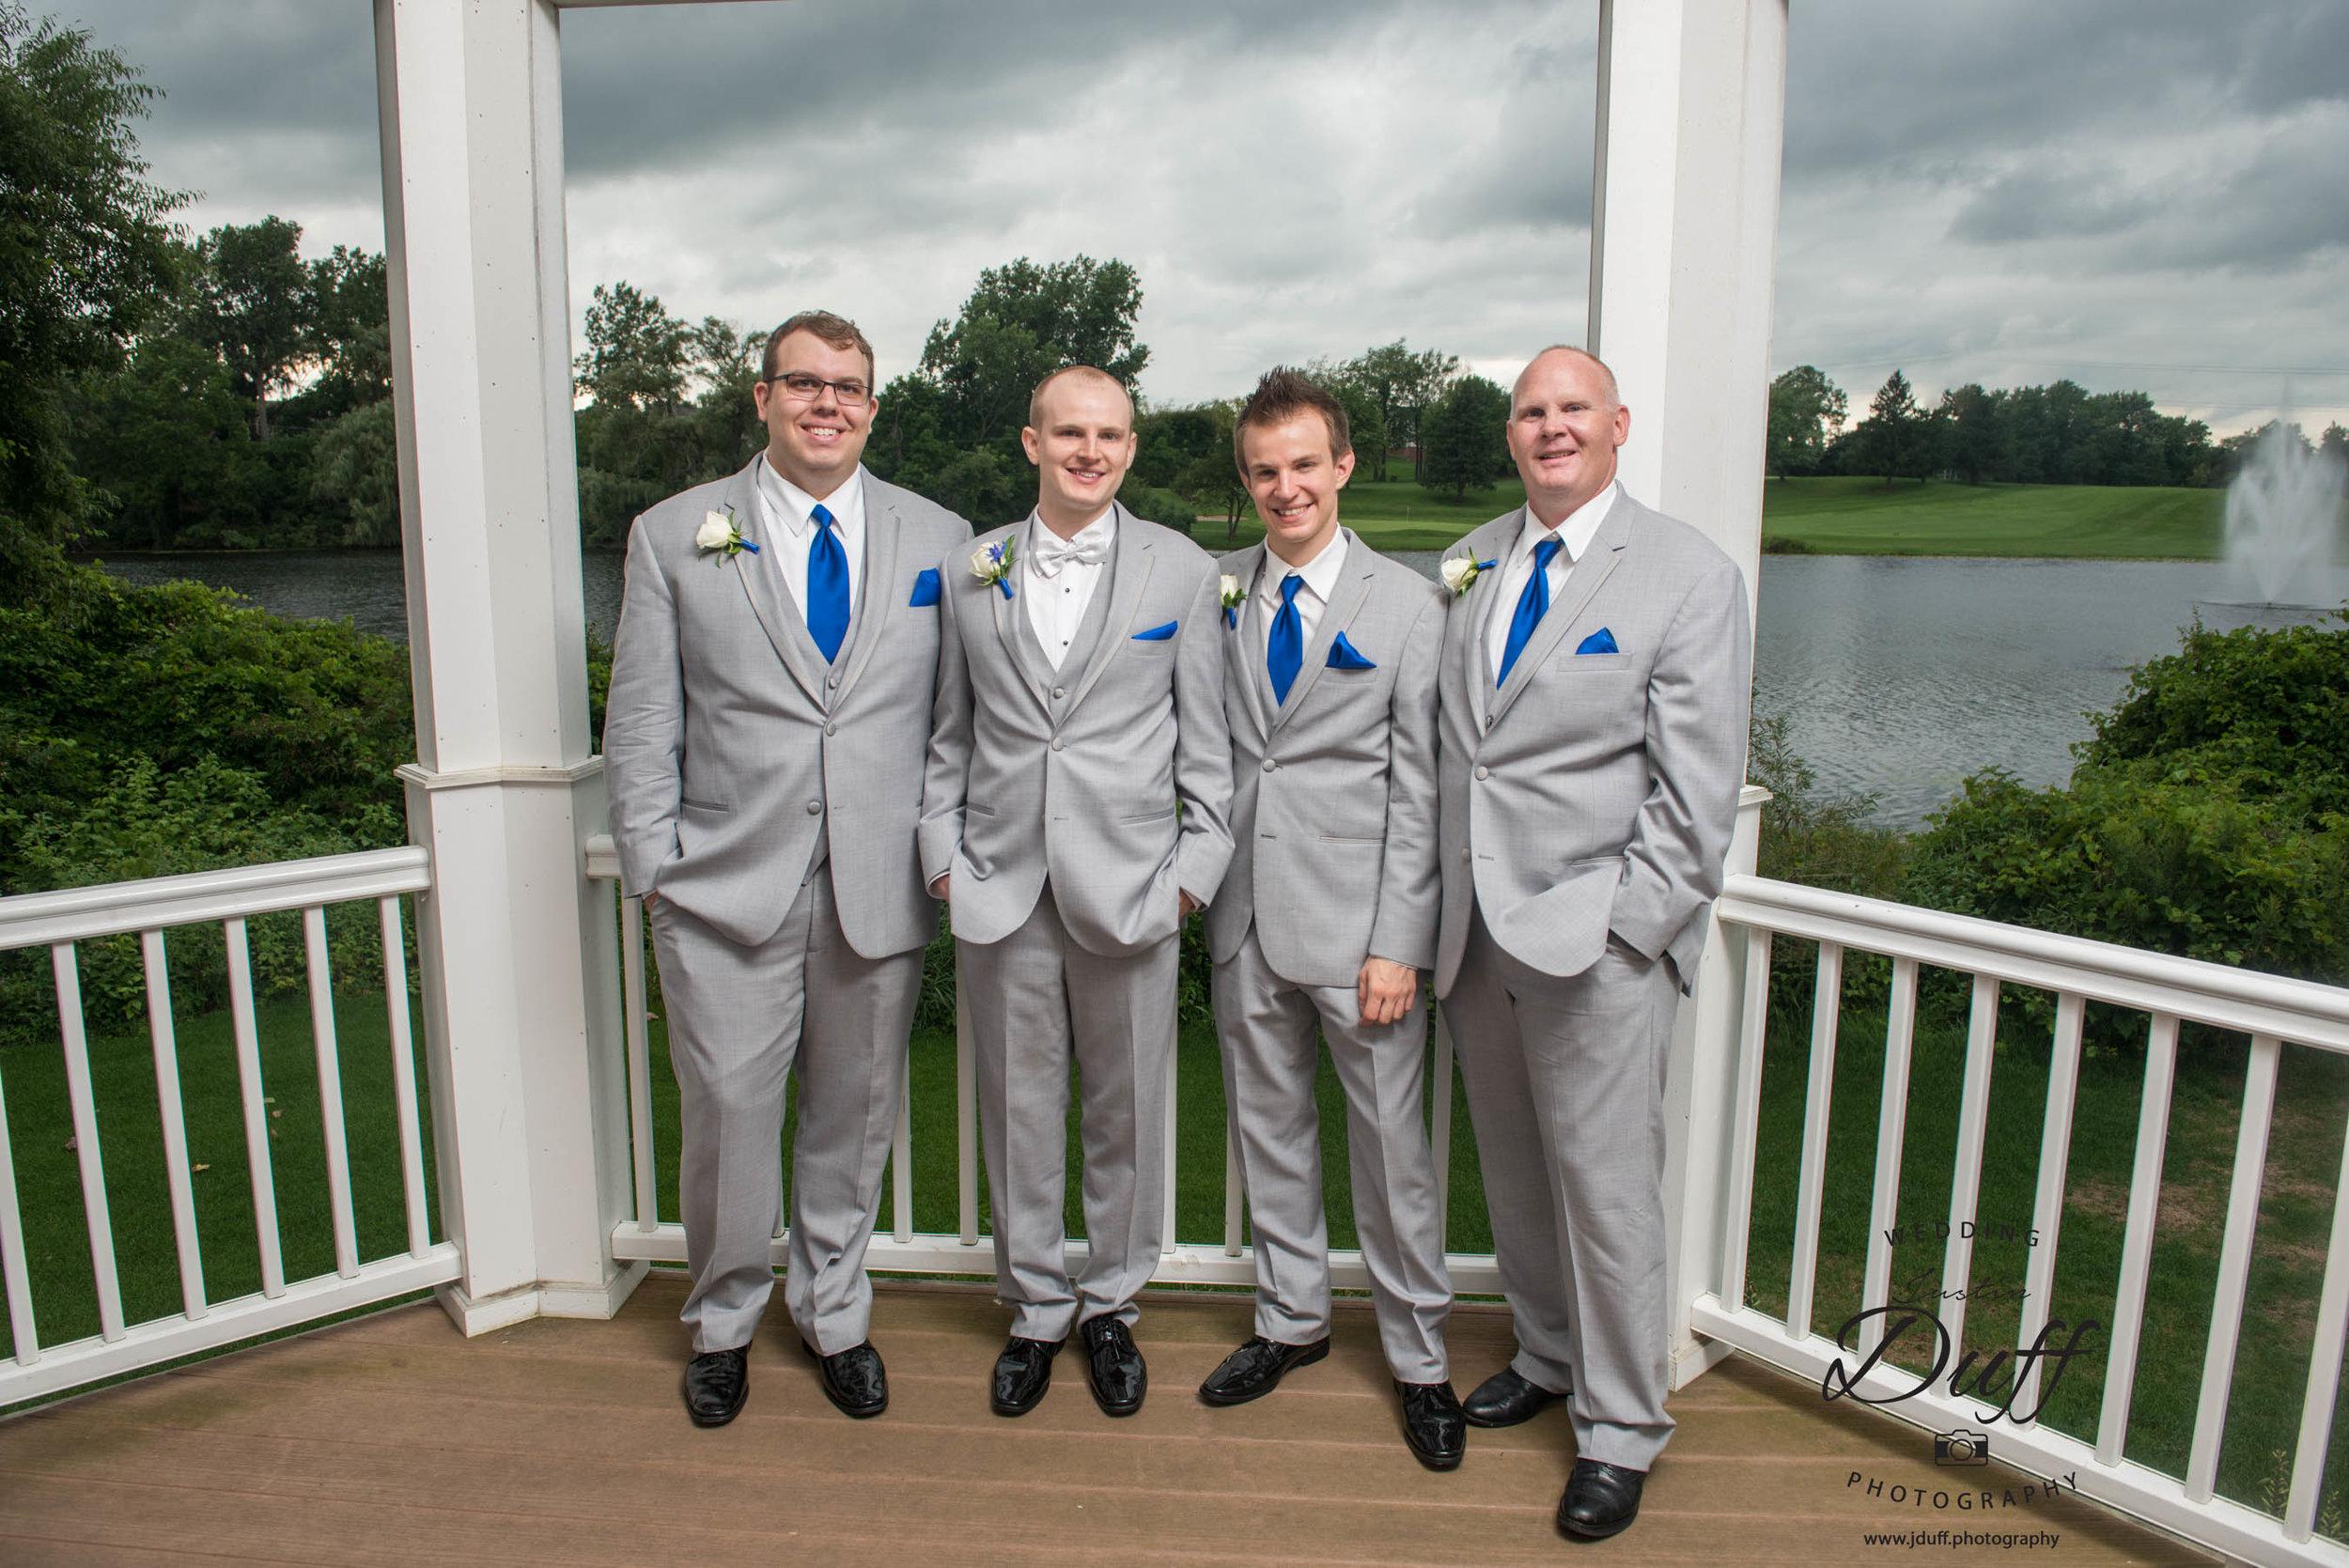 Fountains Golf Course Wedding - Royal Oak Photographer – Deanna & Shane Groom and groomsmen in a gazebo